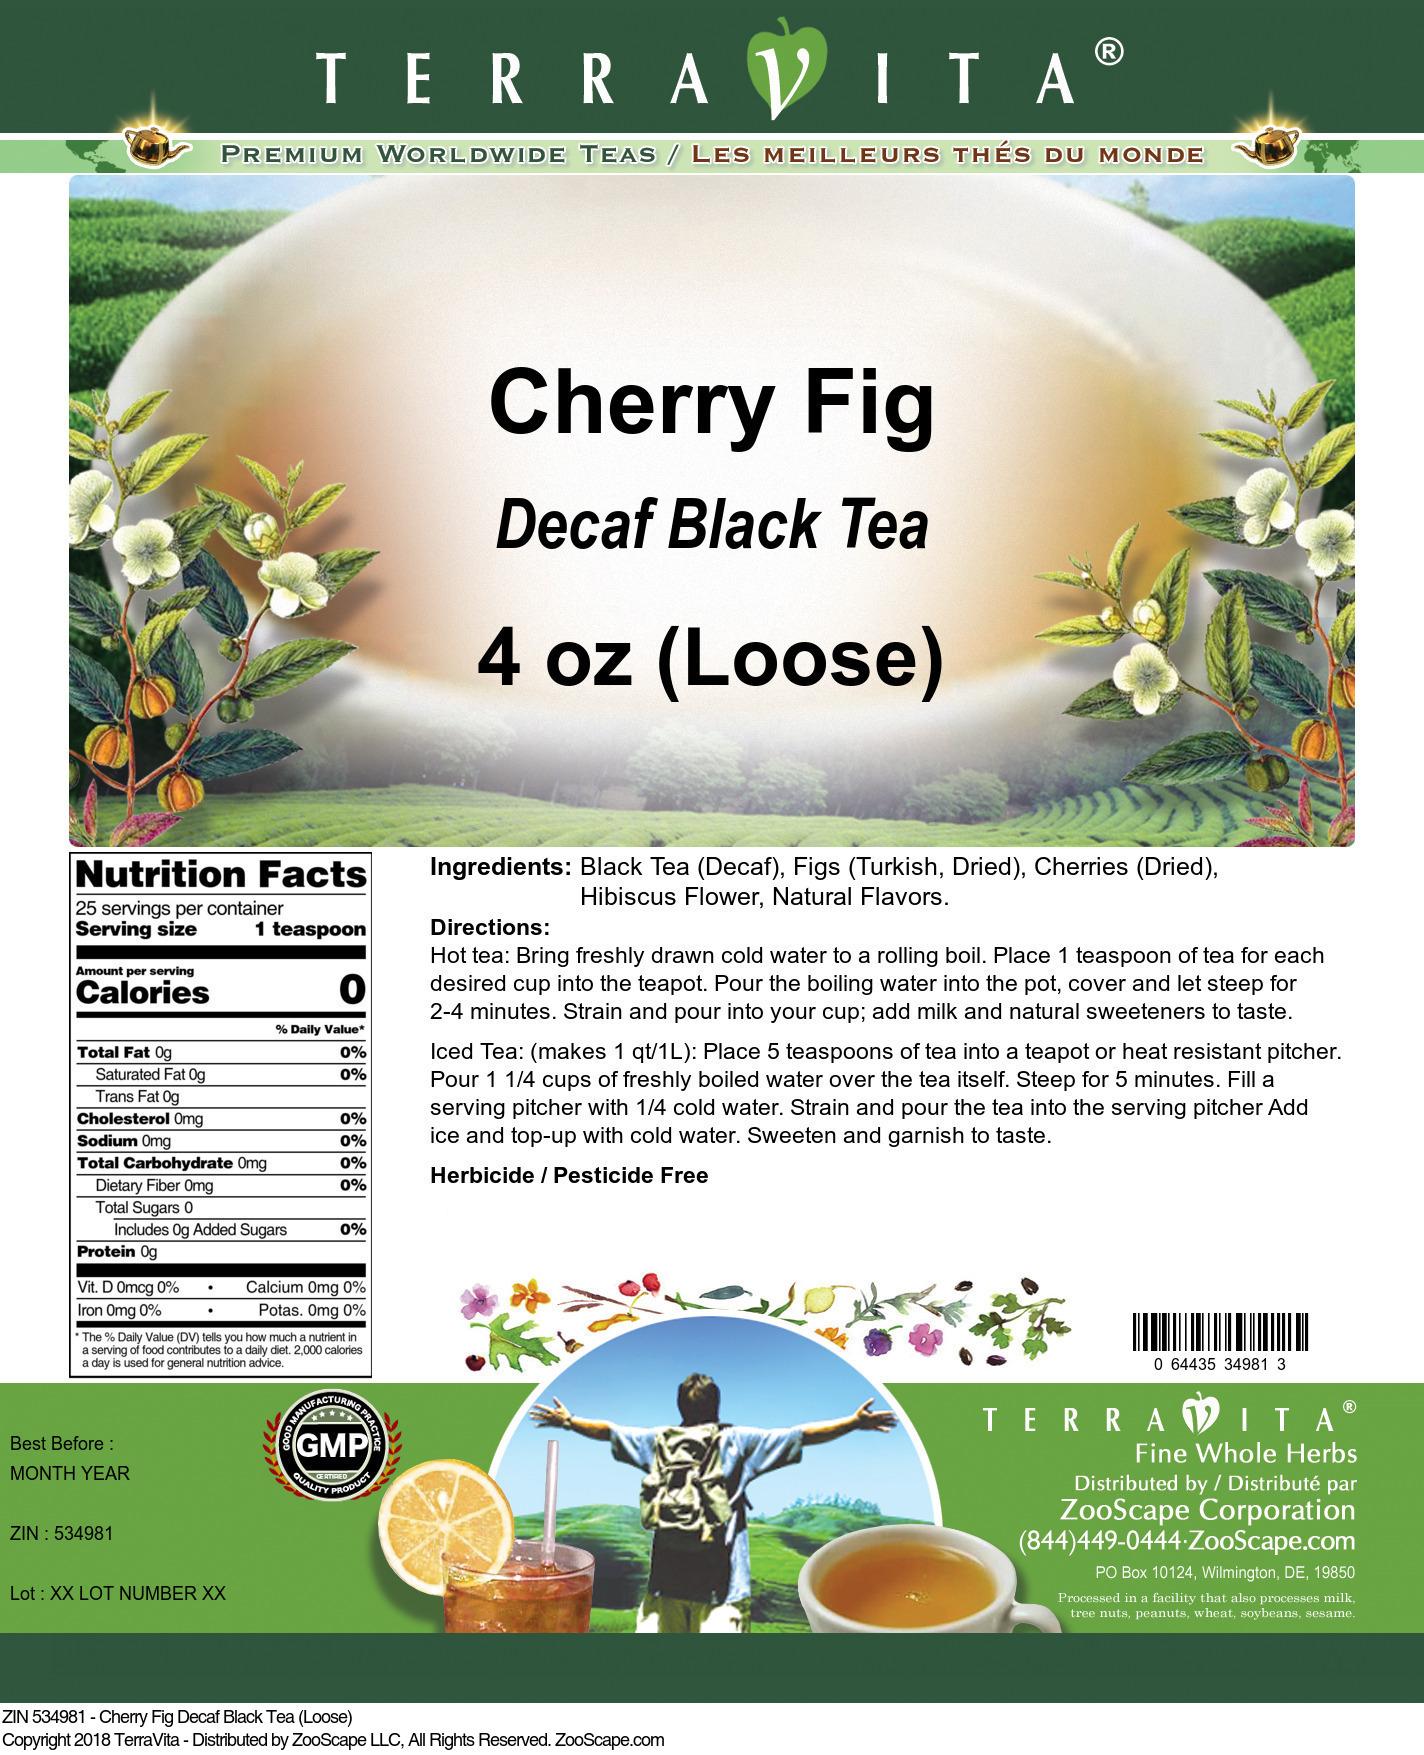 Cherry Fig Decaf Black Tea (Loose)